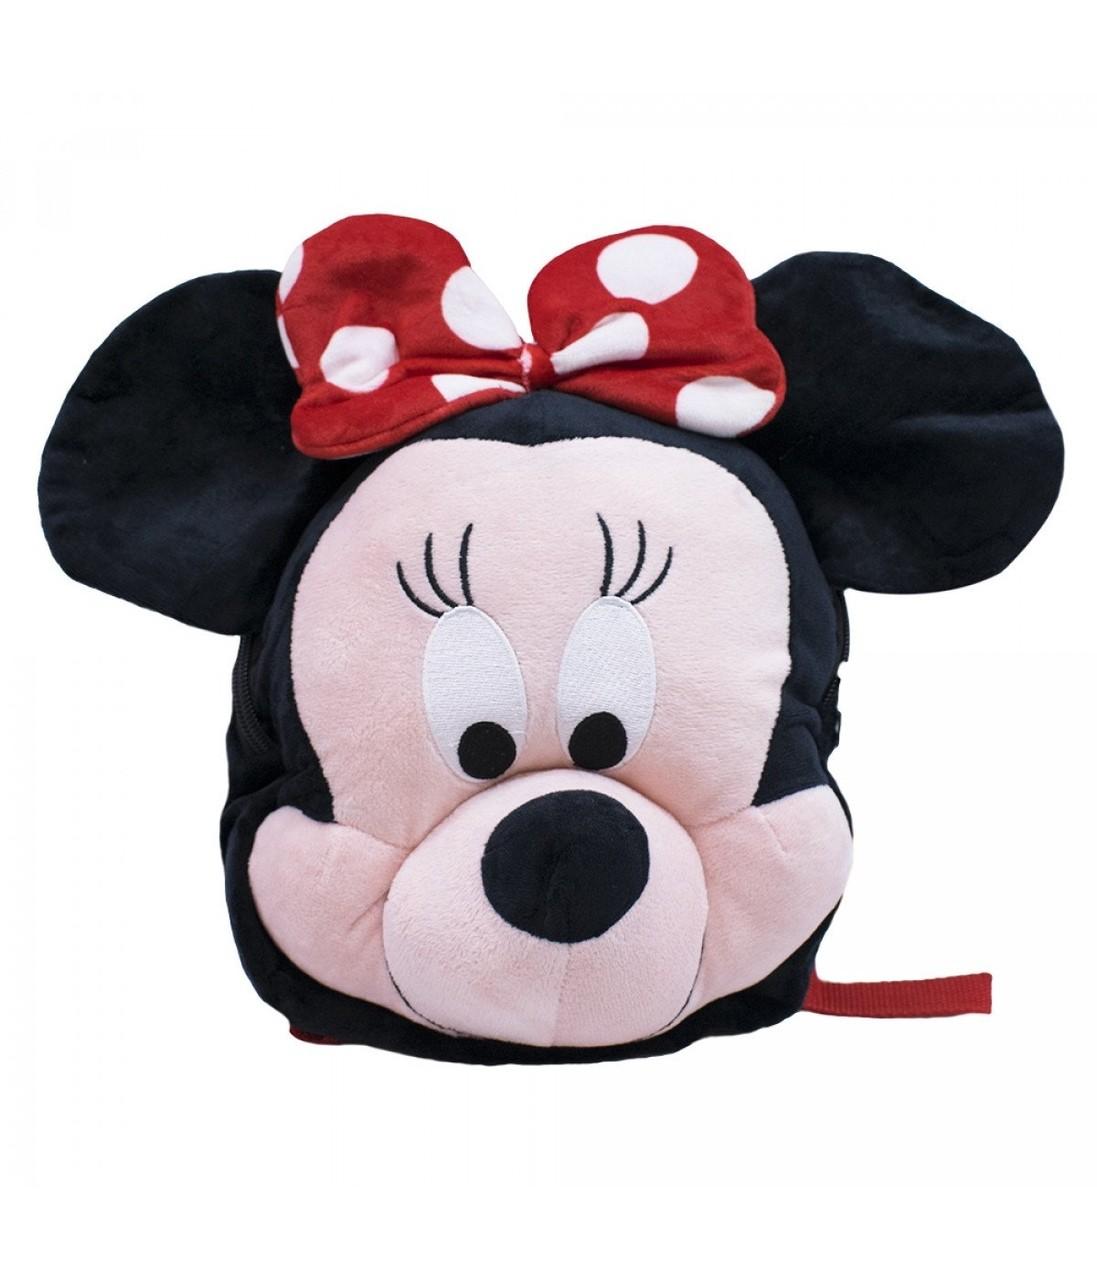 Mochila Bolsa Pelucia Rosto Minnie Mouse